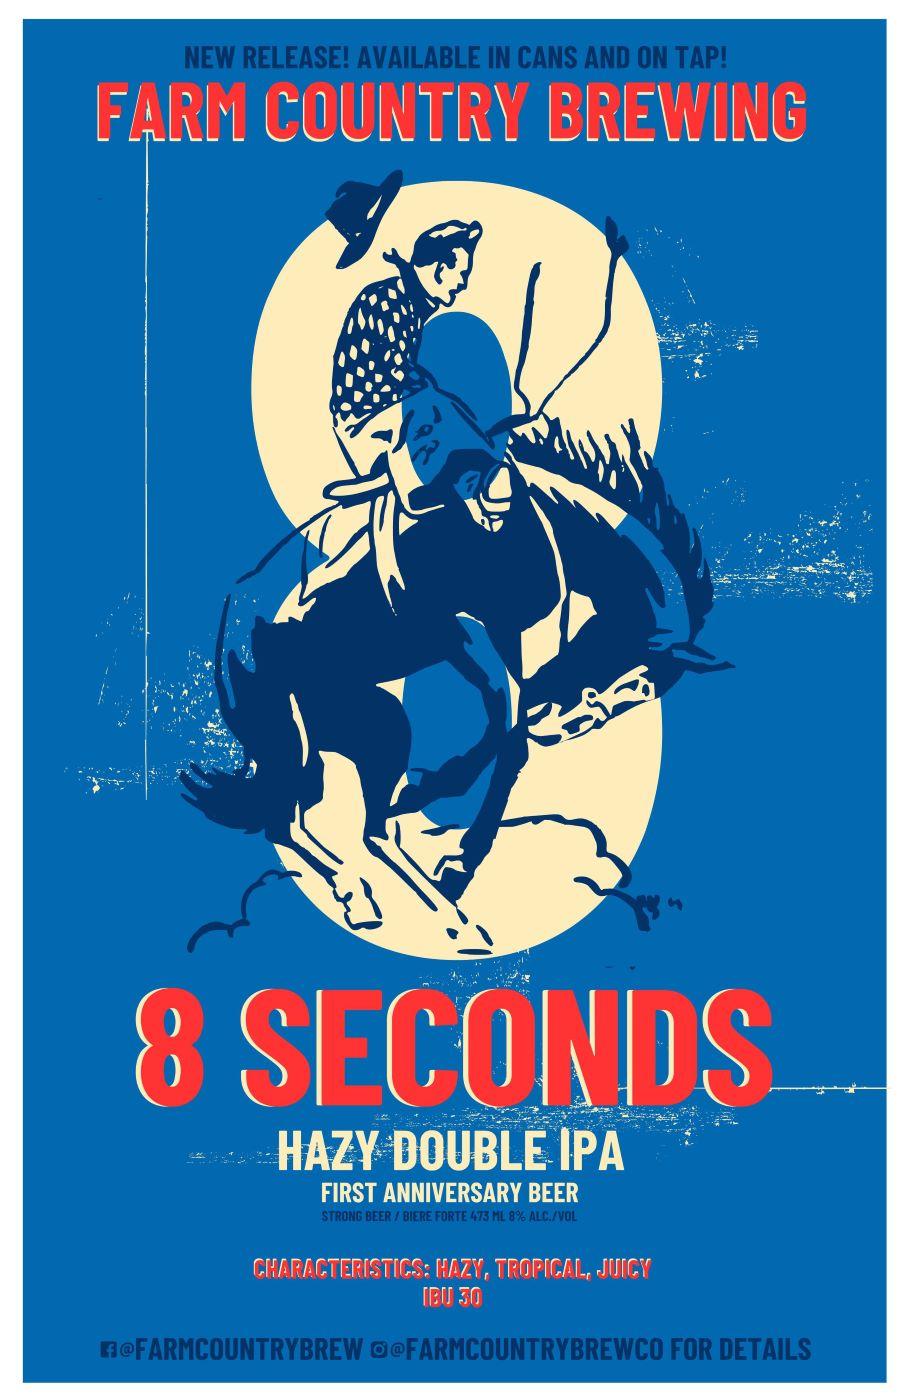 8 seconds double ipa